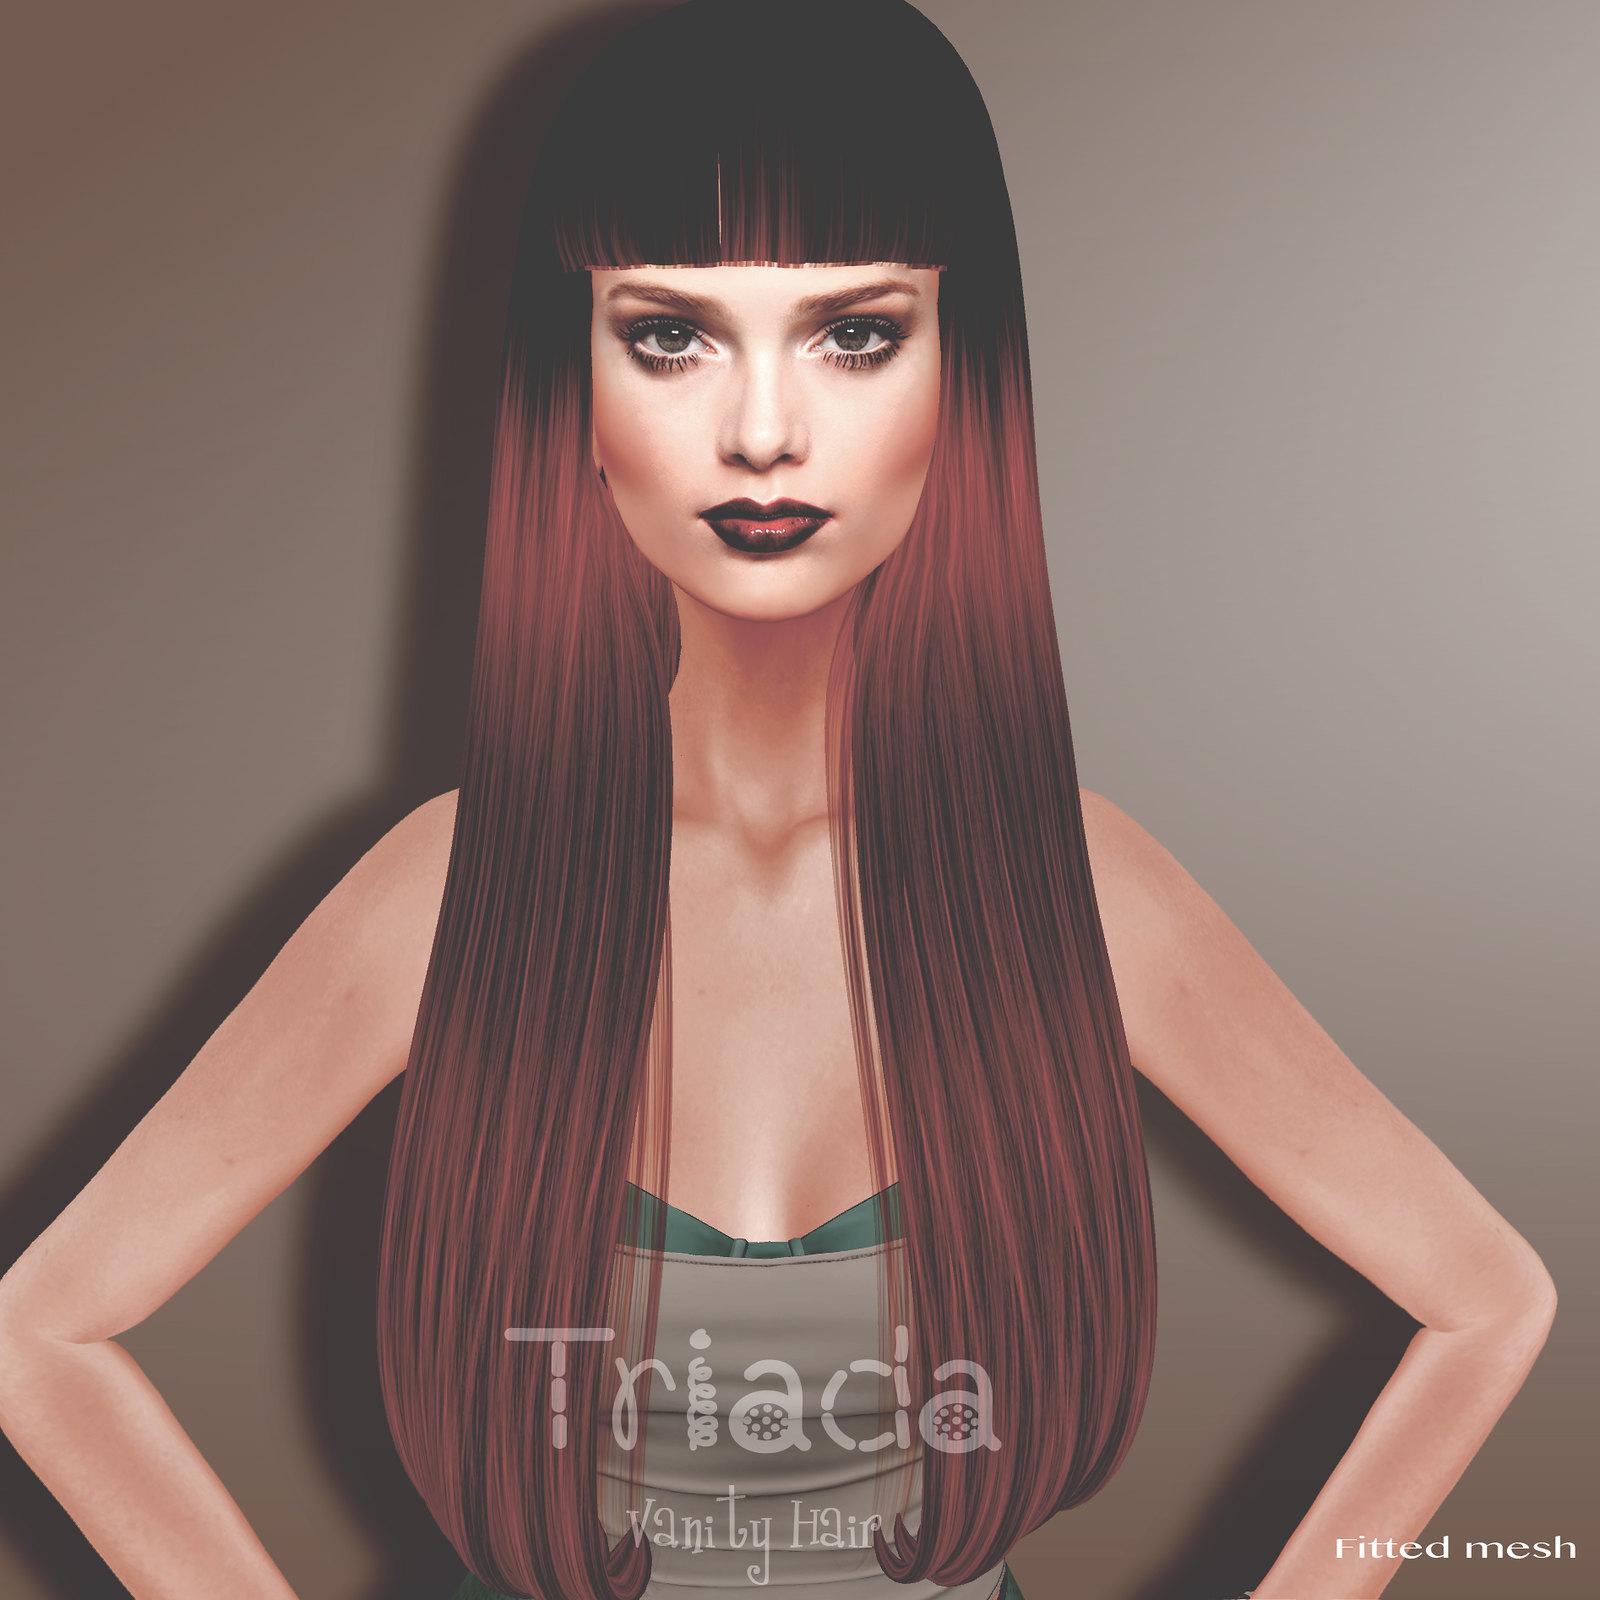 Vanityhair@Triada